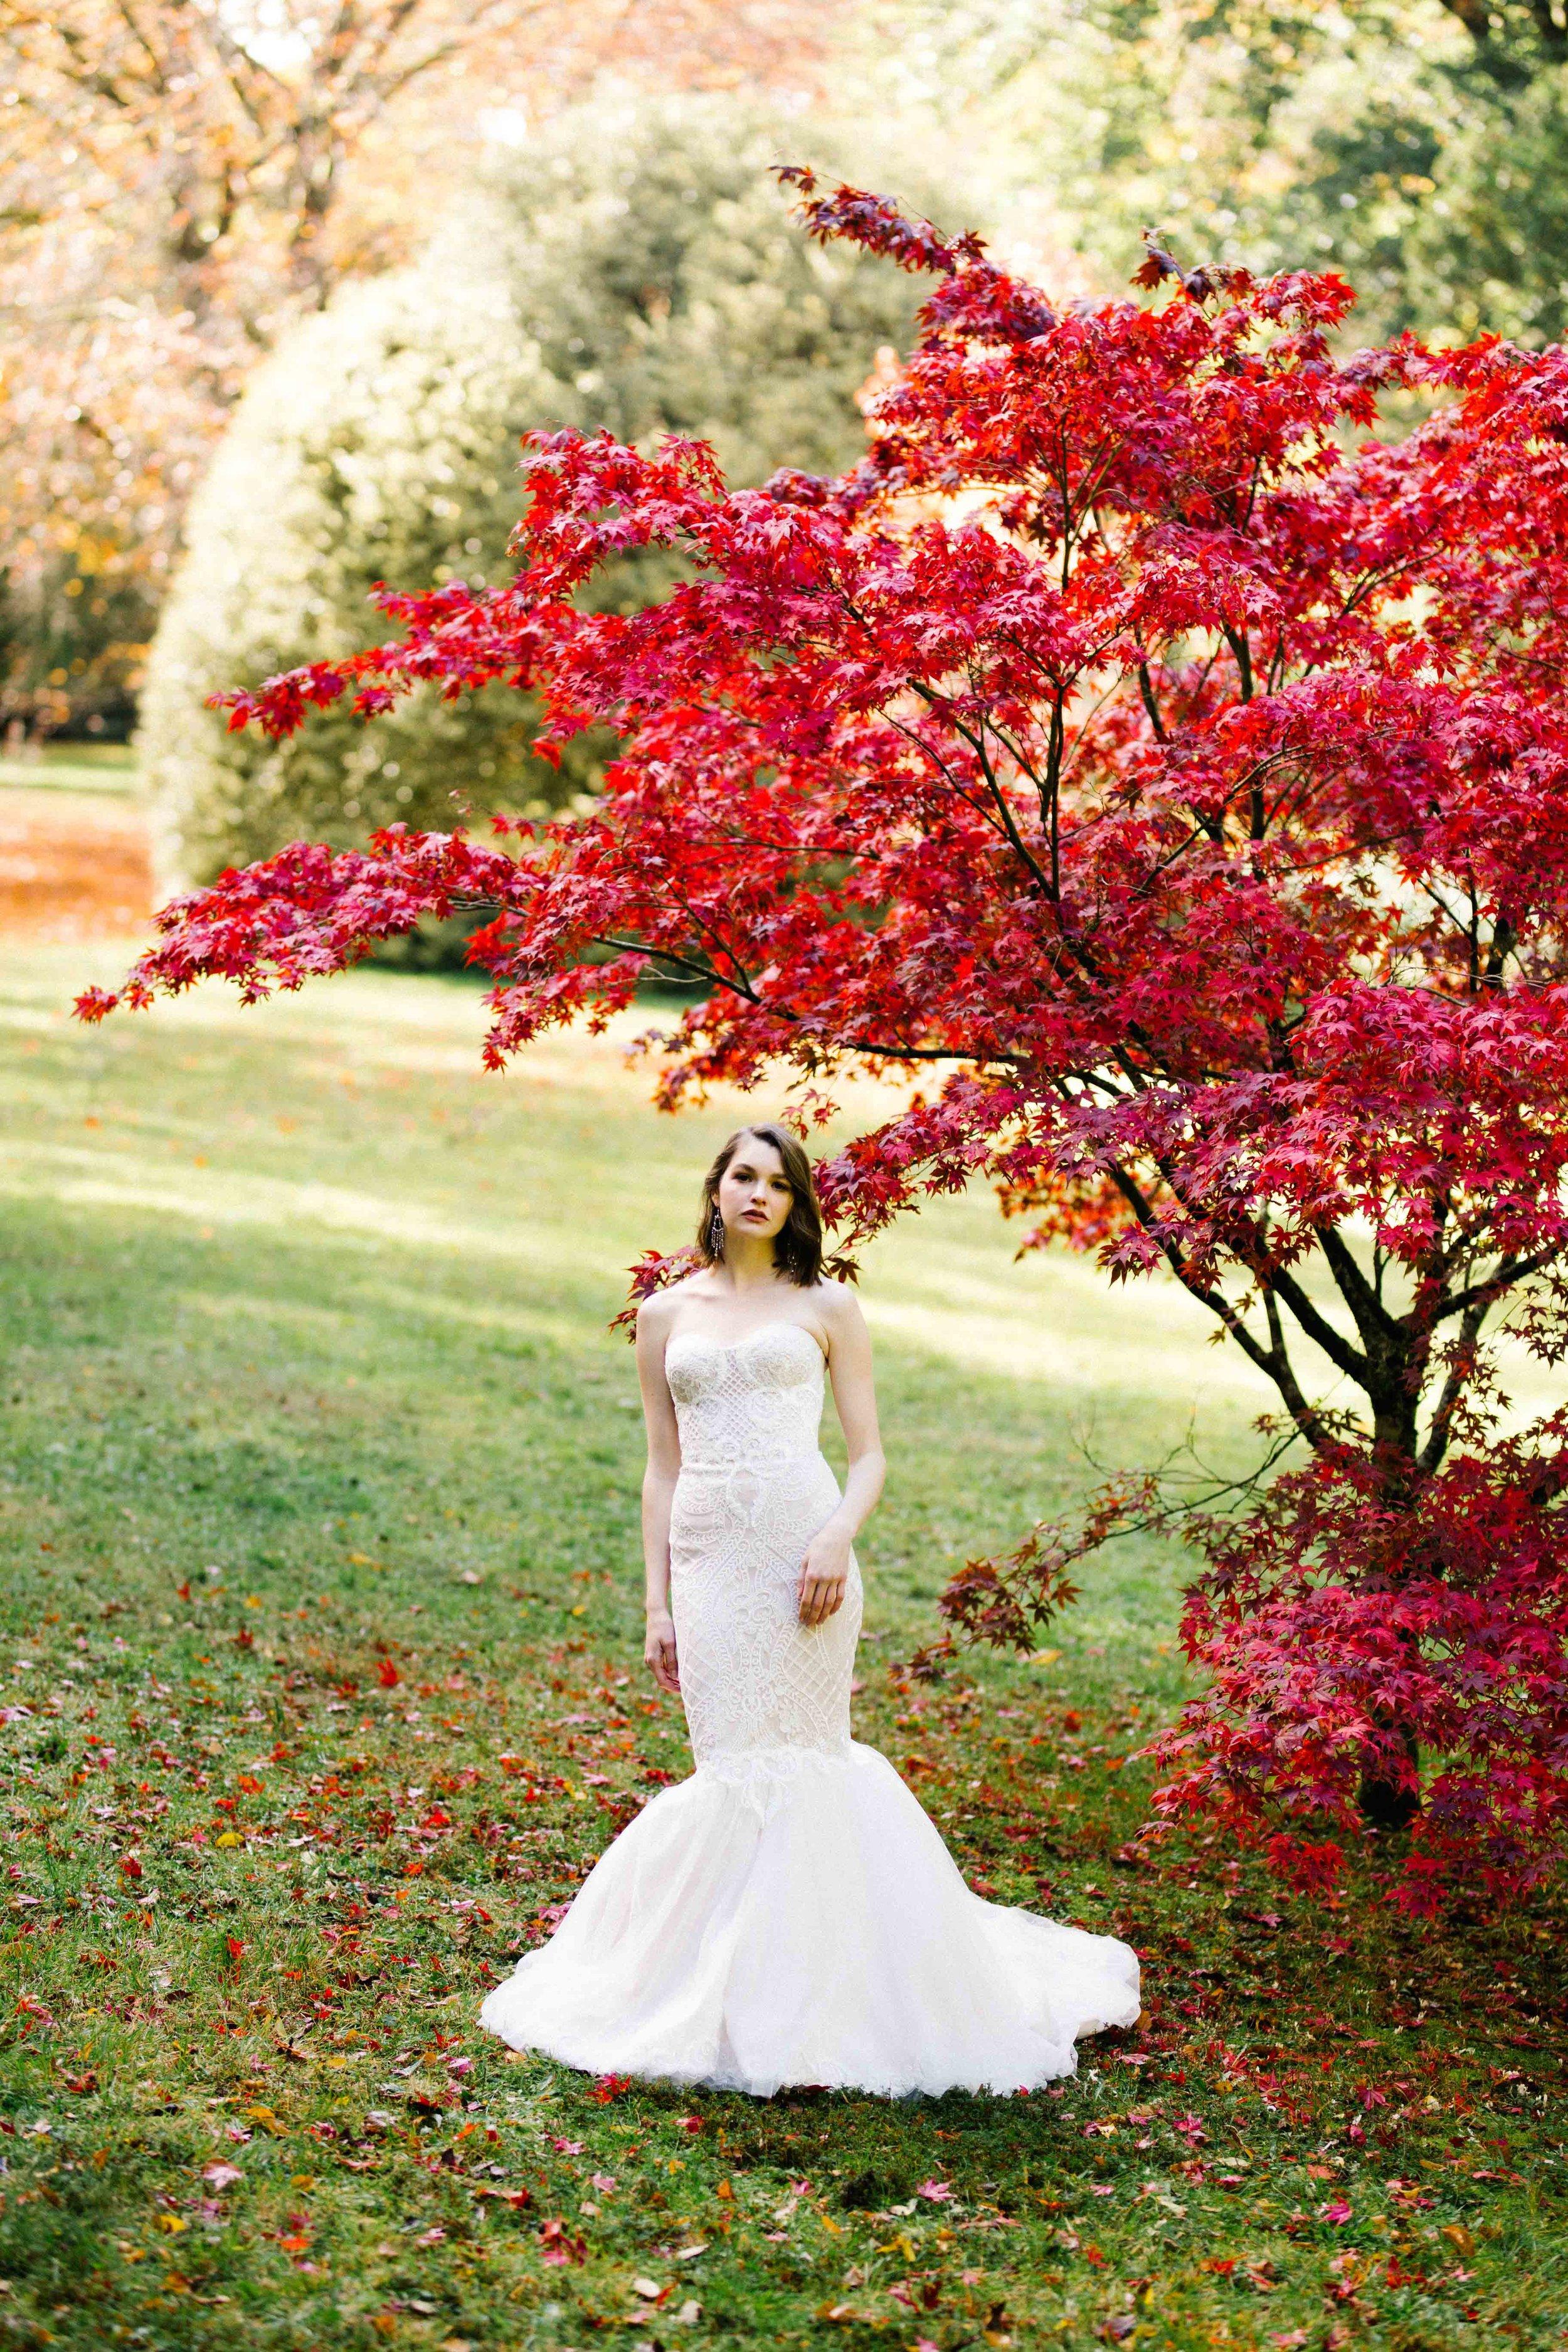 Dancing & Dessert Autumn Bride